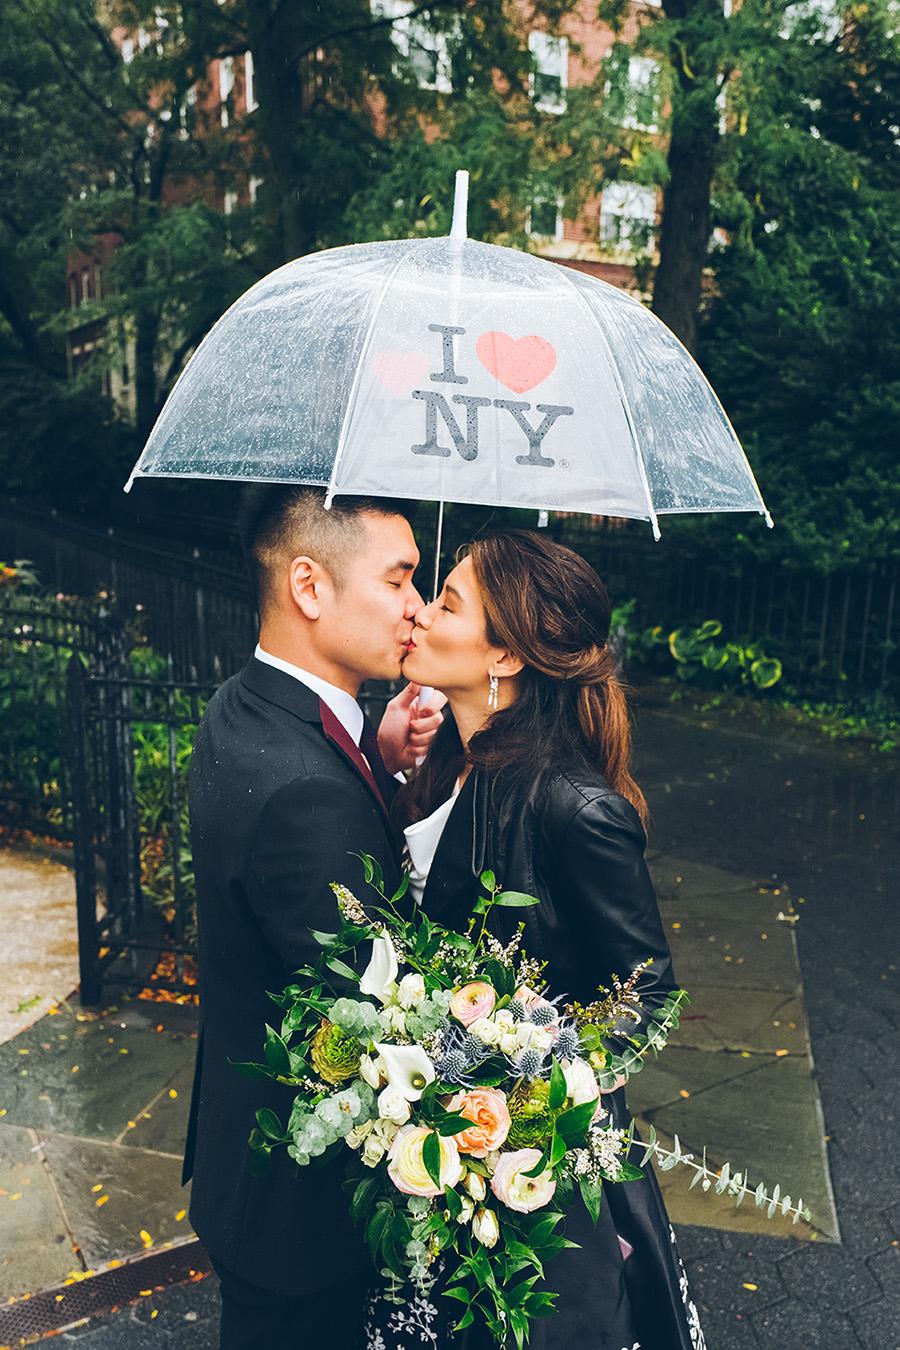 NEW-YORK-CITY-WEDDING-PHOTOGRAPHER-INTIMATE-WEDDING-ELOPEMENT-BROOKLYN-PROMENADE-CITYHALL-MANHATTAN-BROOKLYN-WEDDING-PHOTOGRAPHY-JackieAaron-0025.jpg